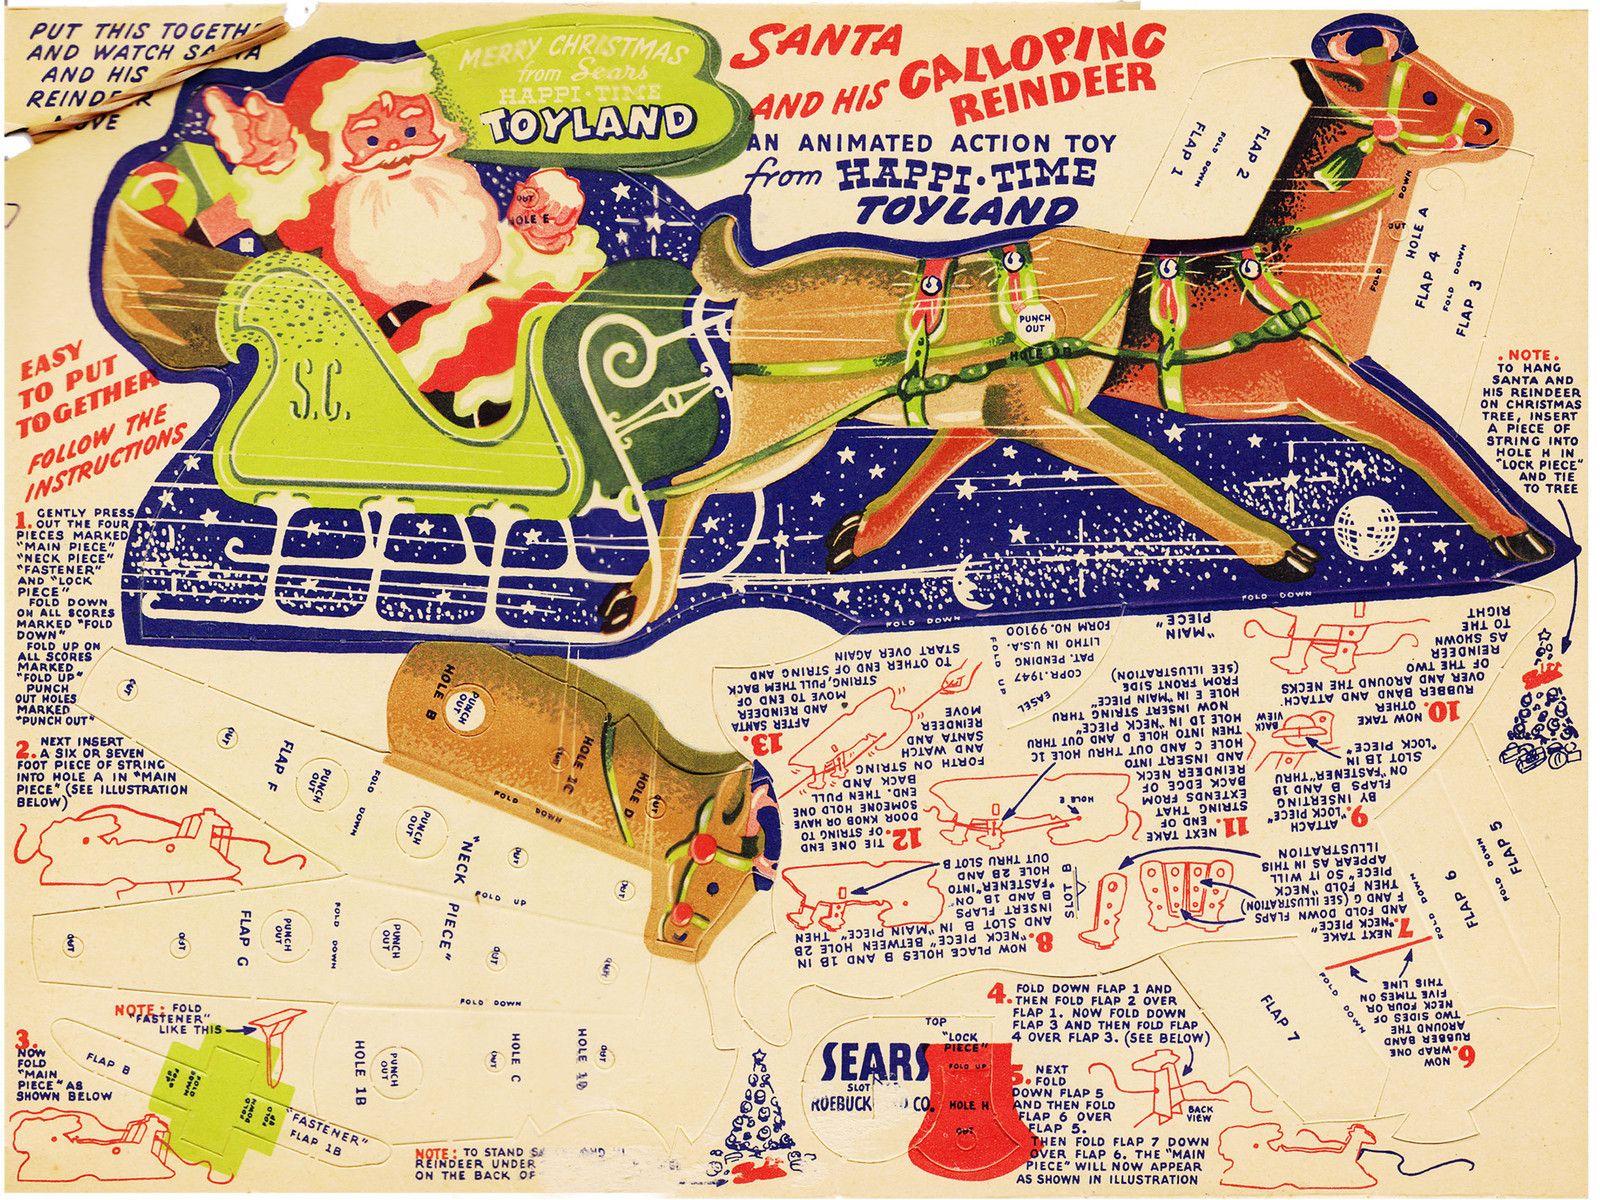 VNT 1950s Santas Workshop CHRISTmas PAPER DOLL HD LASR REPRODUCTIN TOP SEL LOPr